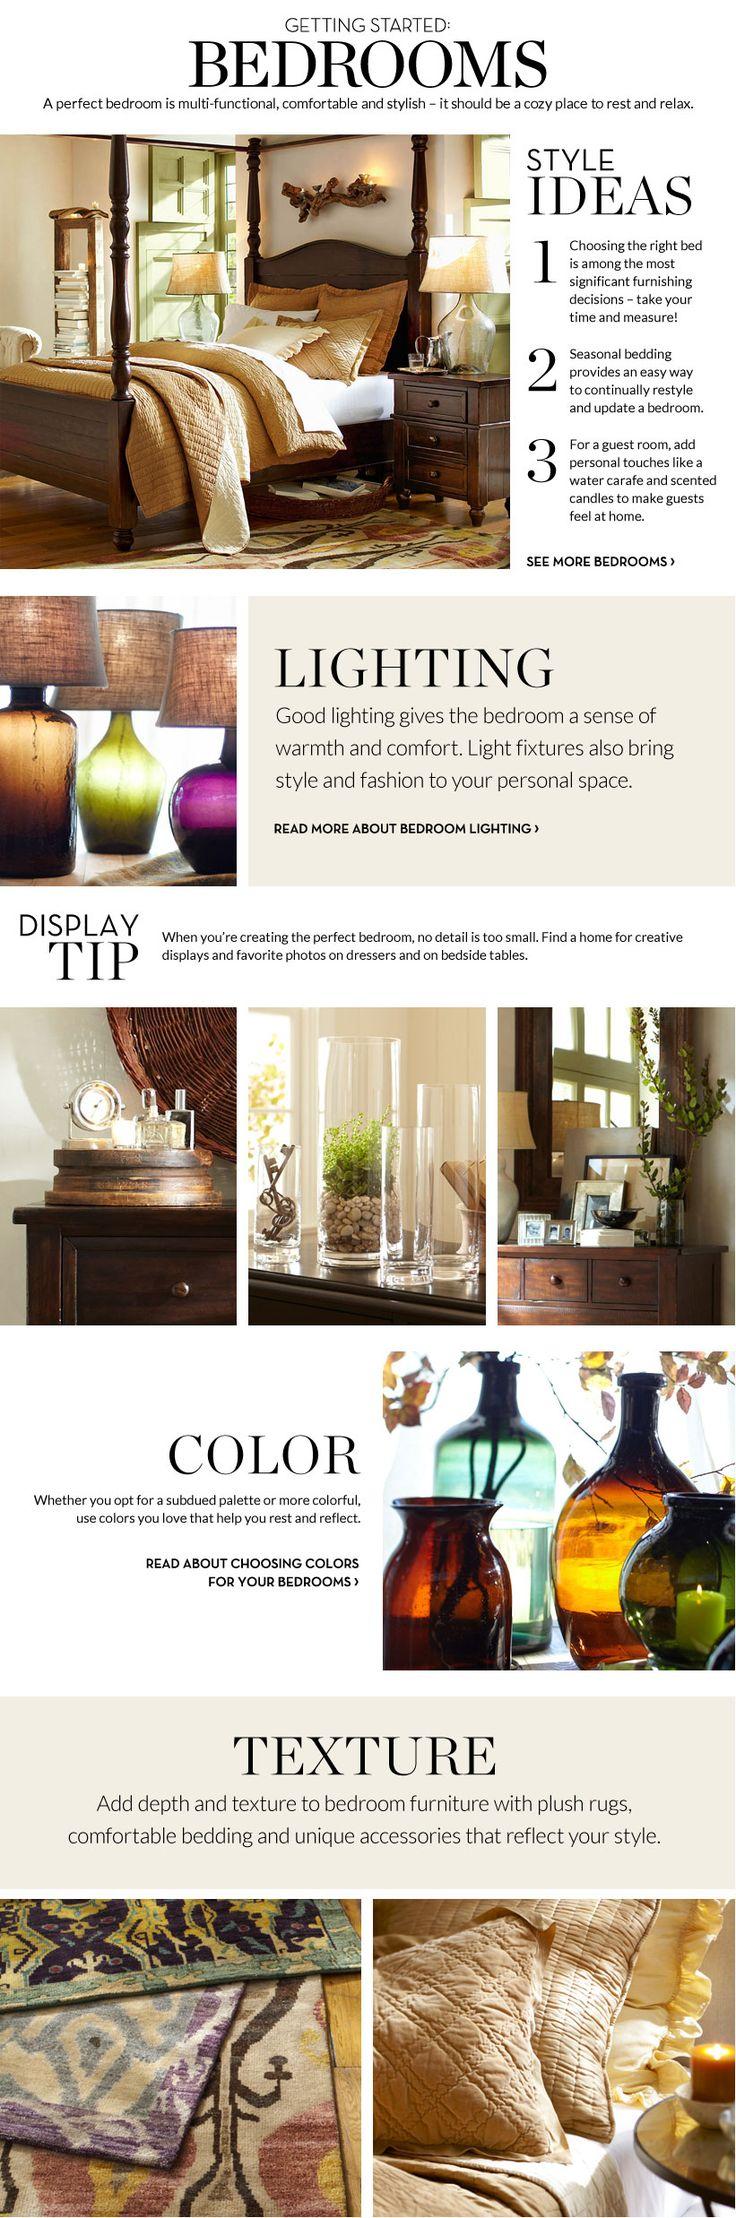 best 20 barn bedrooms ideas on pinterest sliding bathroom doors bedroom decorating ideas bedroom decorating decor pottery barn